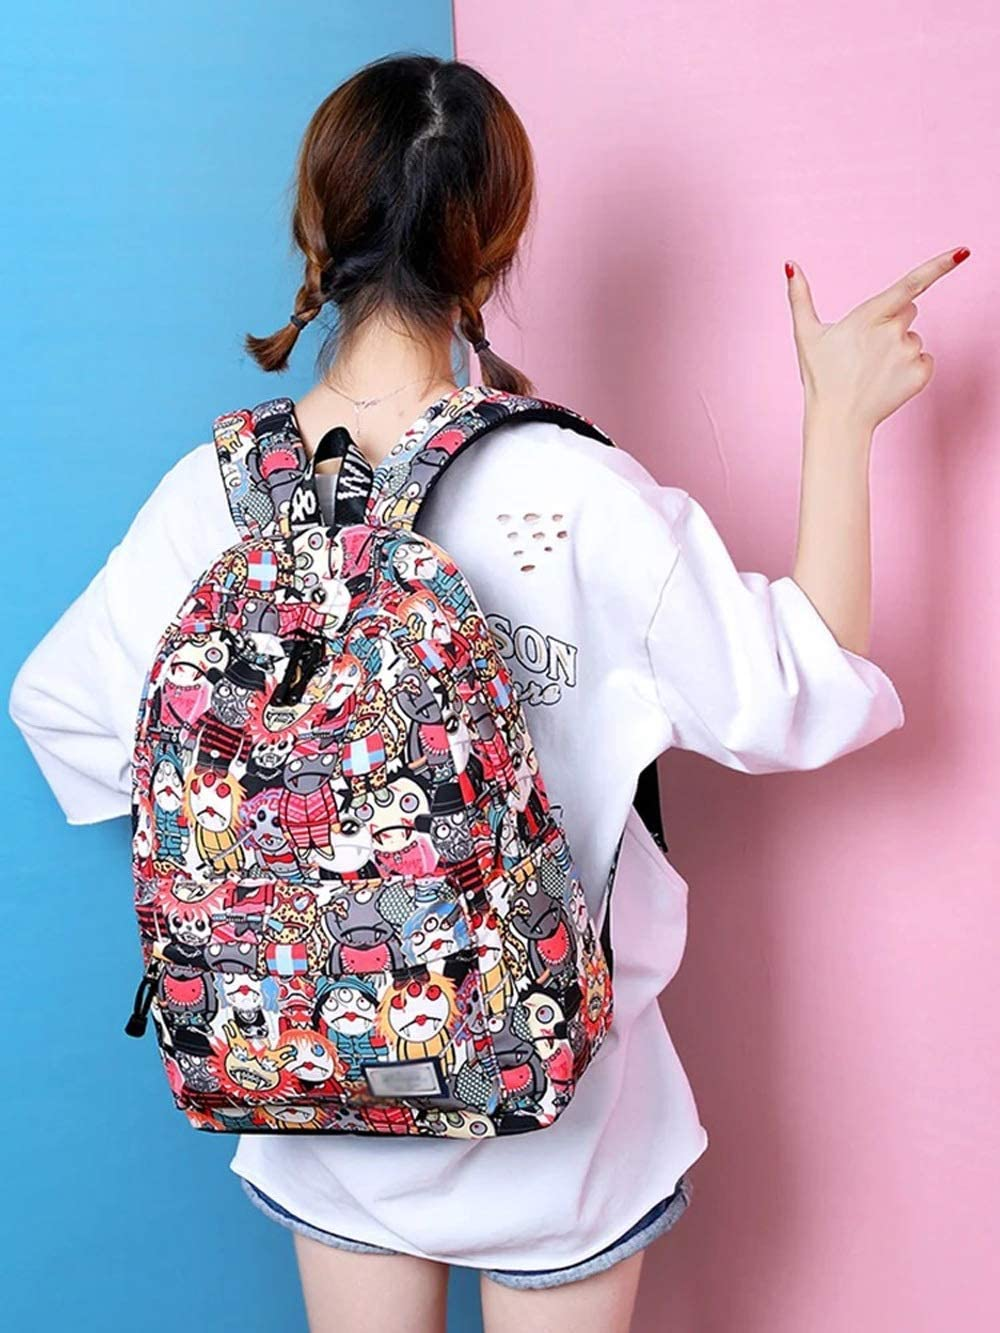 CGH Printing Canvas Backpack Rucksack Kindergarten School Student Bag for Boys Girls Kids Children Toddlers